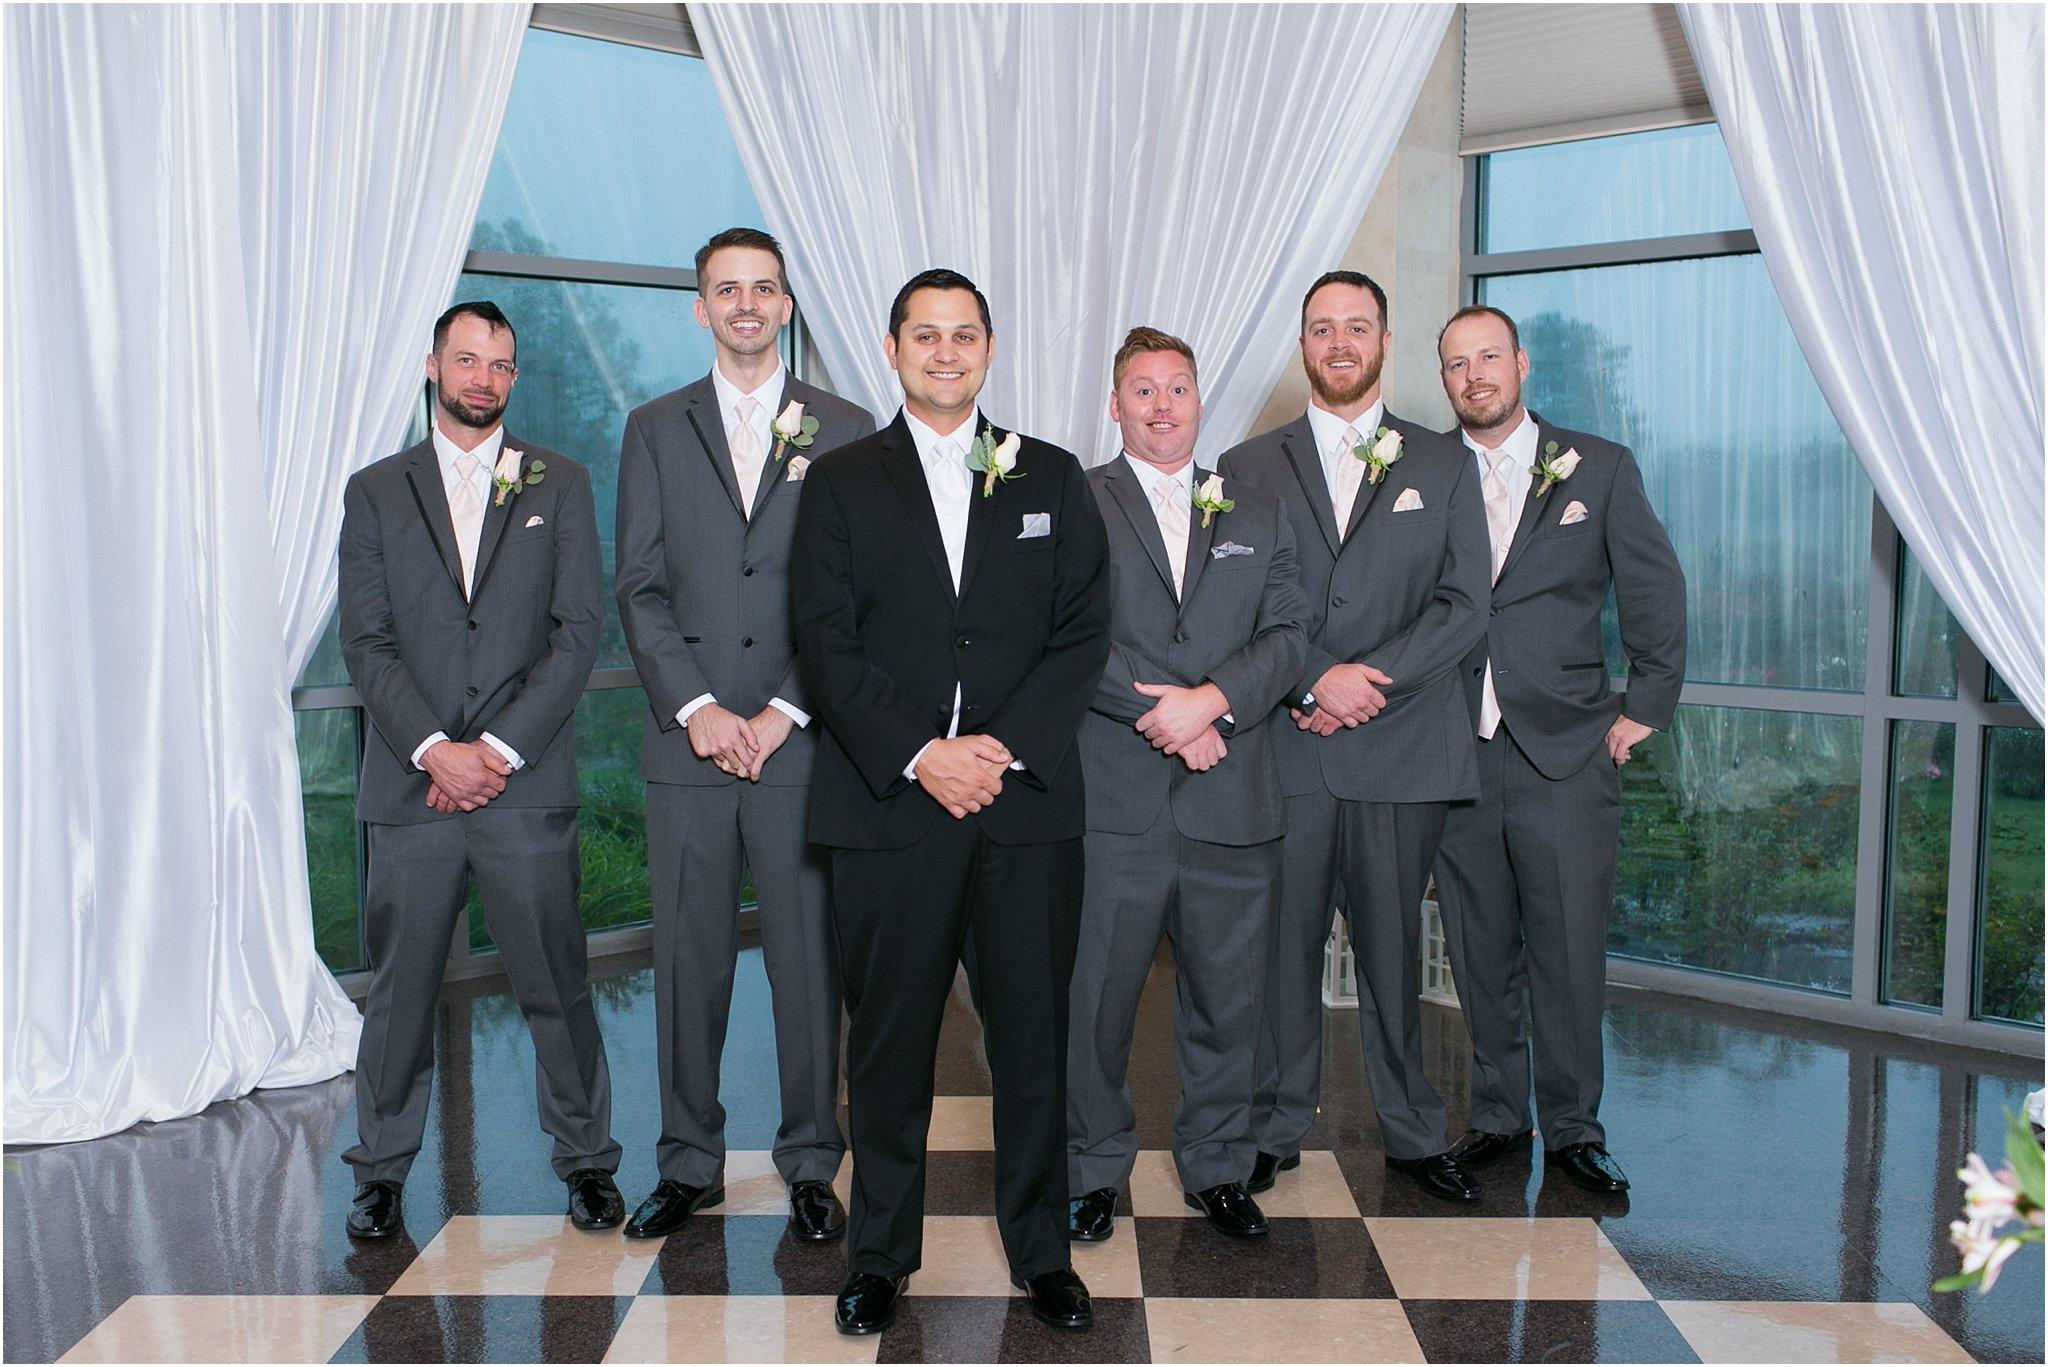 jessica_ryan_photography_virginia_wedding_photographer_wedding_hurricane_norfolk_botanical_gardens_hurricane_matthew_wedding_3580